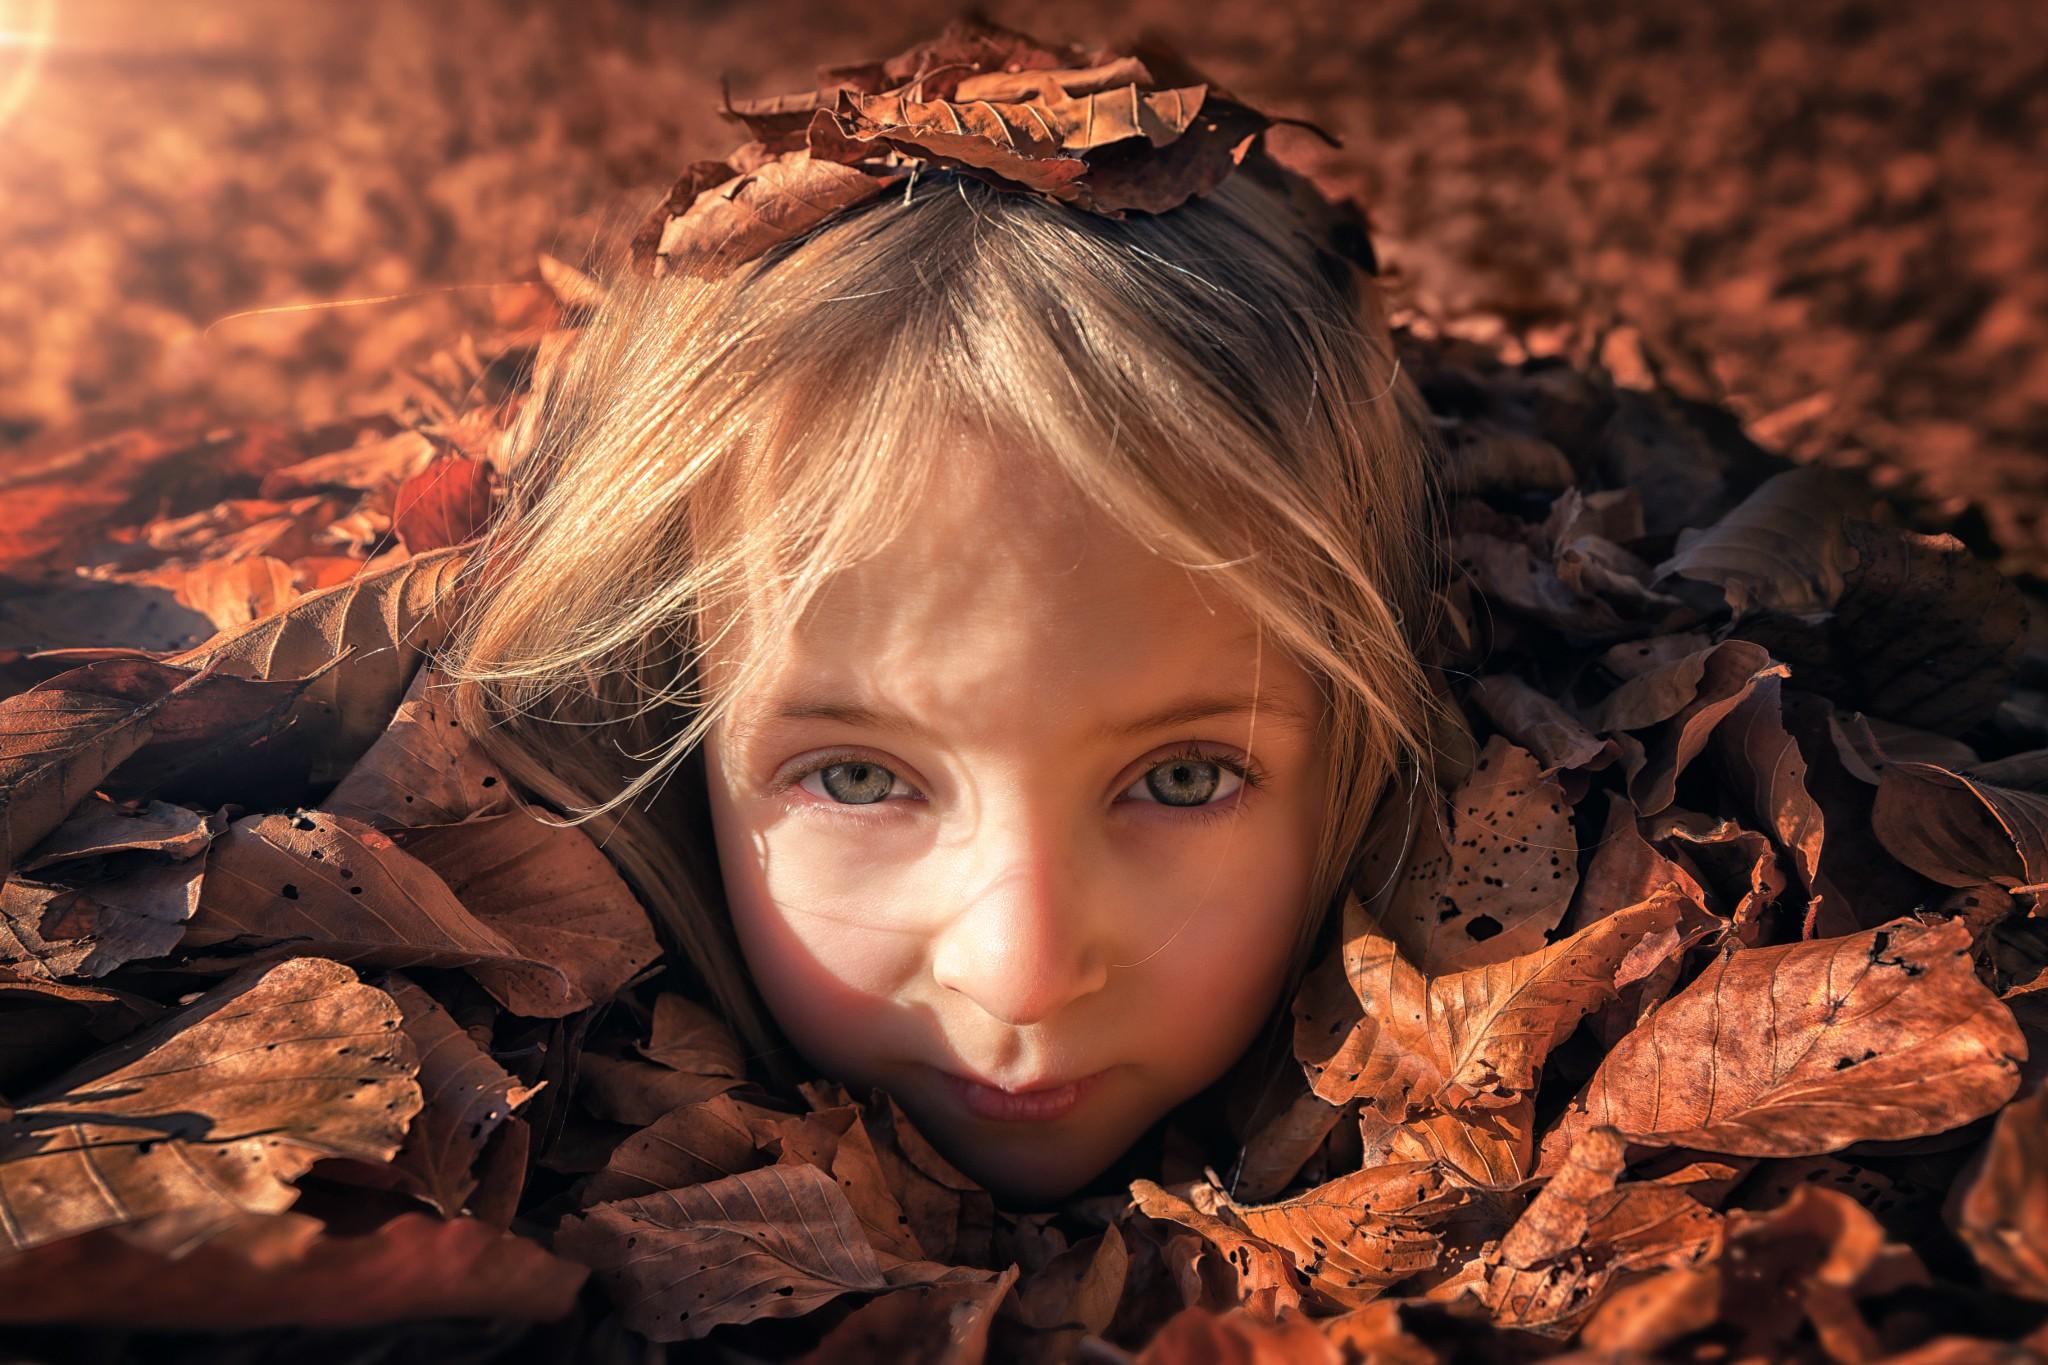 Wallpaper Leaves Model Blonde Blue Eyes Children Emotion Spring Skin Head Dry Autumn Child Flower Girl Beauty Eye Woman Lady Darkness Portrait Photography Close Up 2048x1365 Sergiucoj 86776 Hd Wallpapers Wallhere